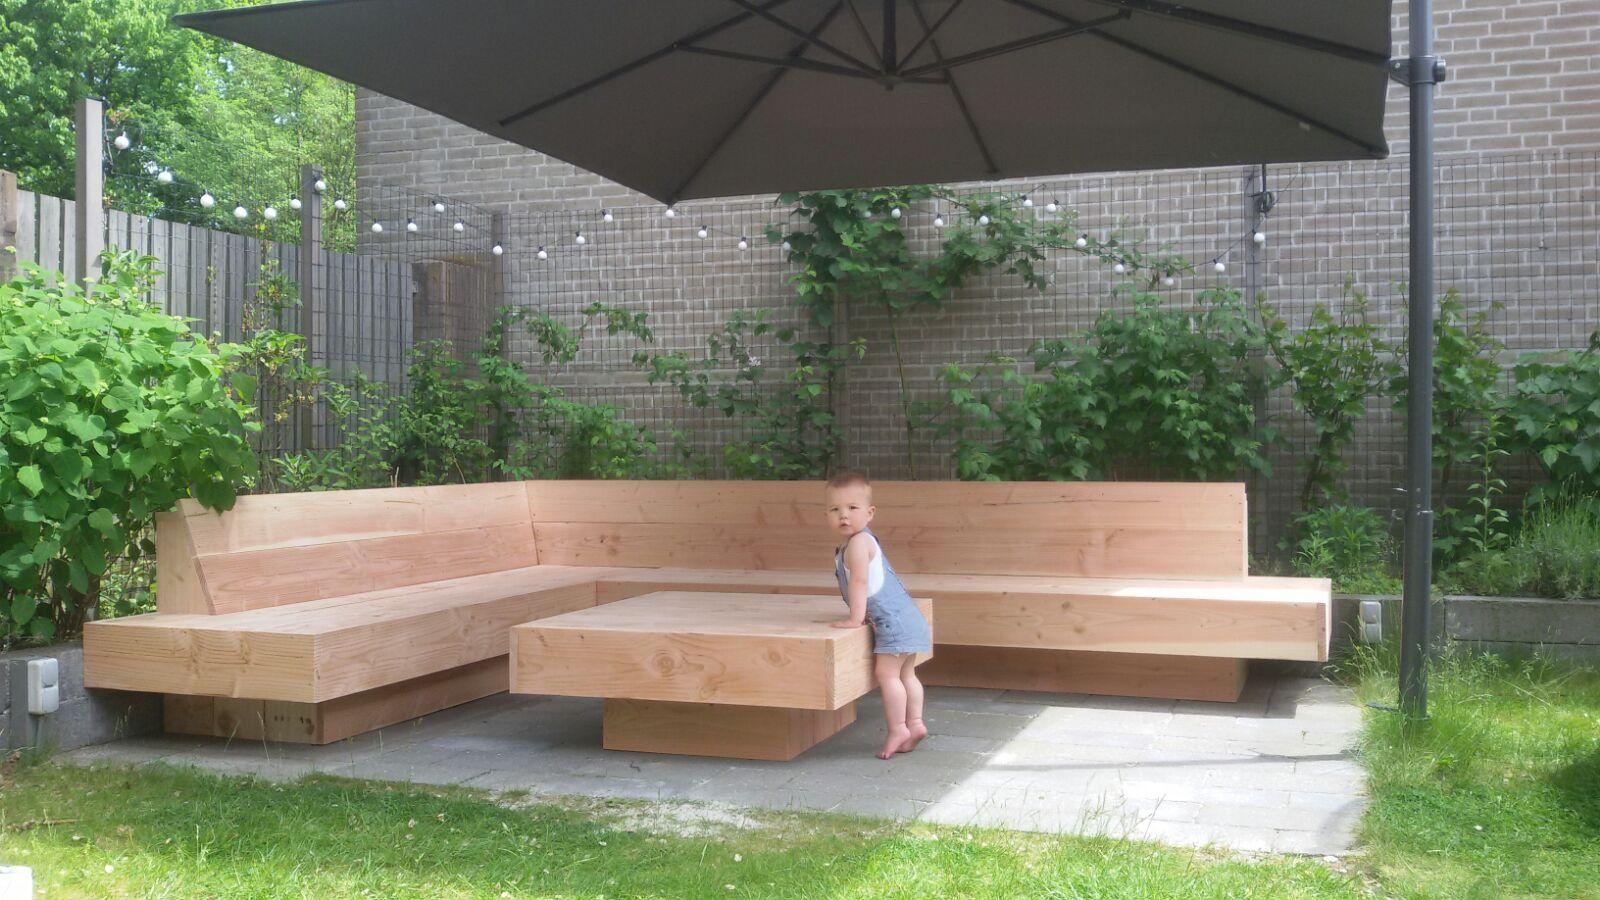 hoekbank hout tuin good with hoekbank hout tuin elegant. Black Bedroom Furniture Sets. Home Design Ideas